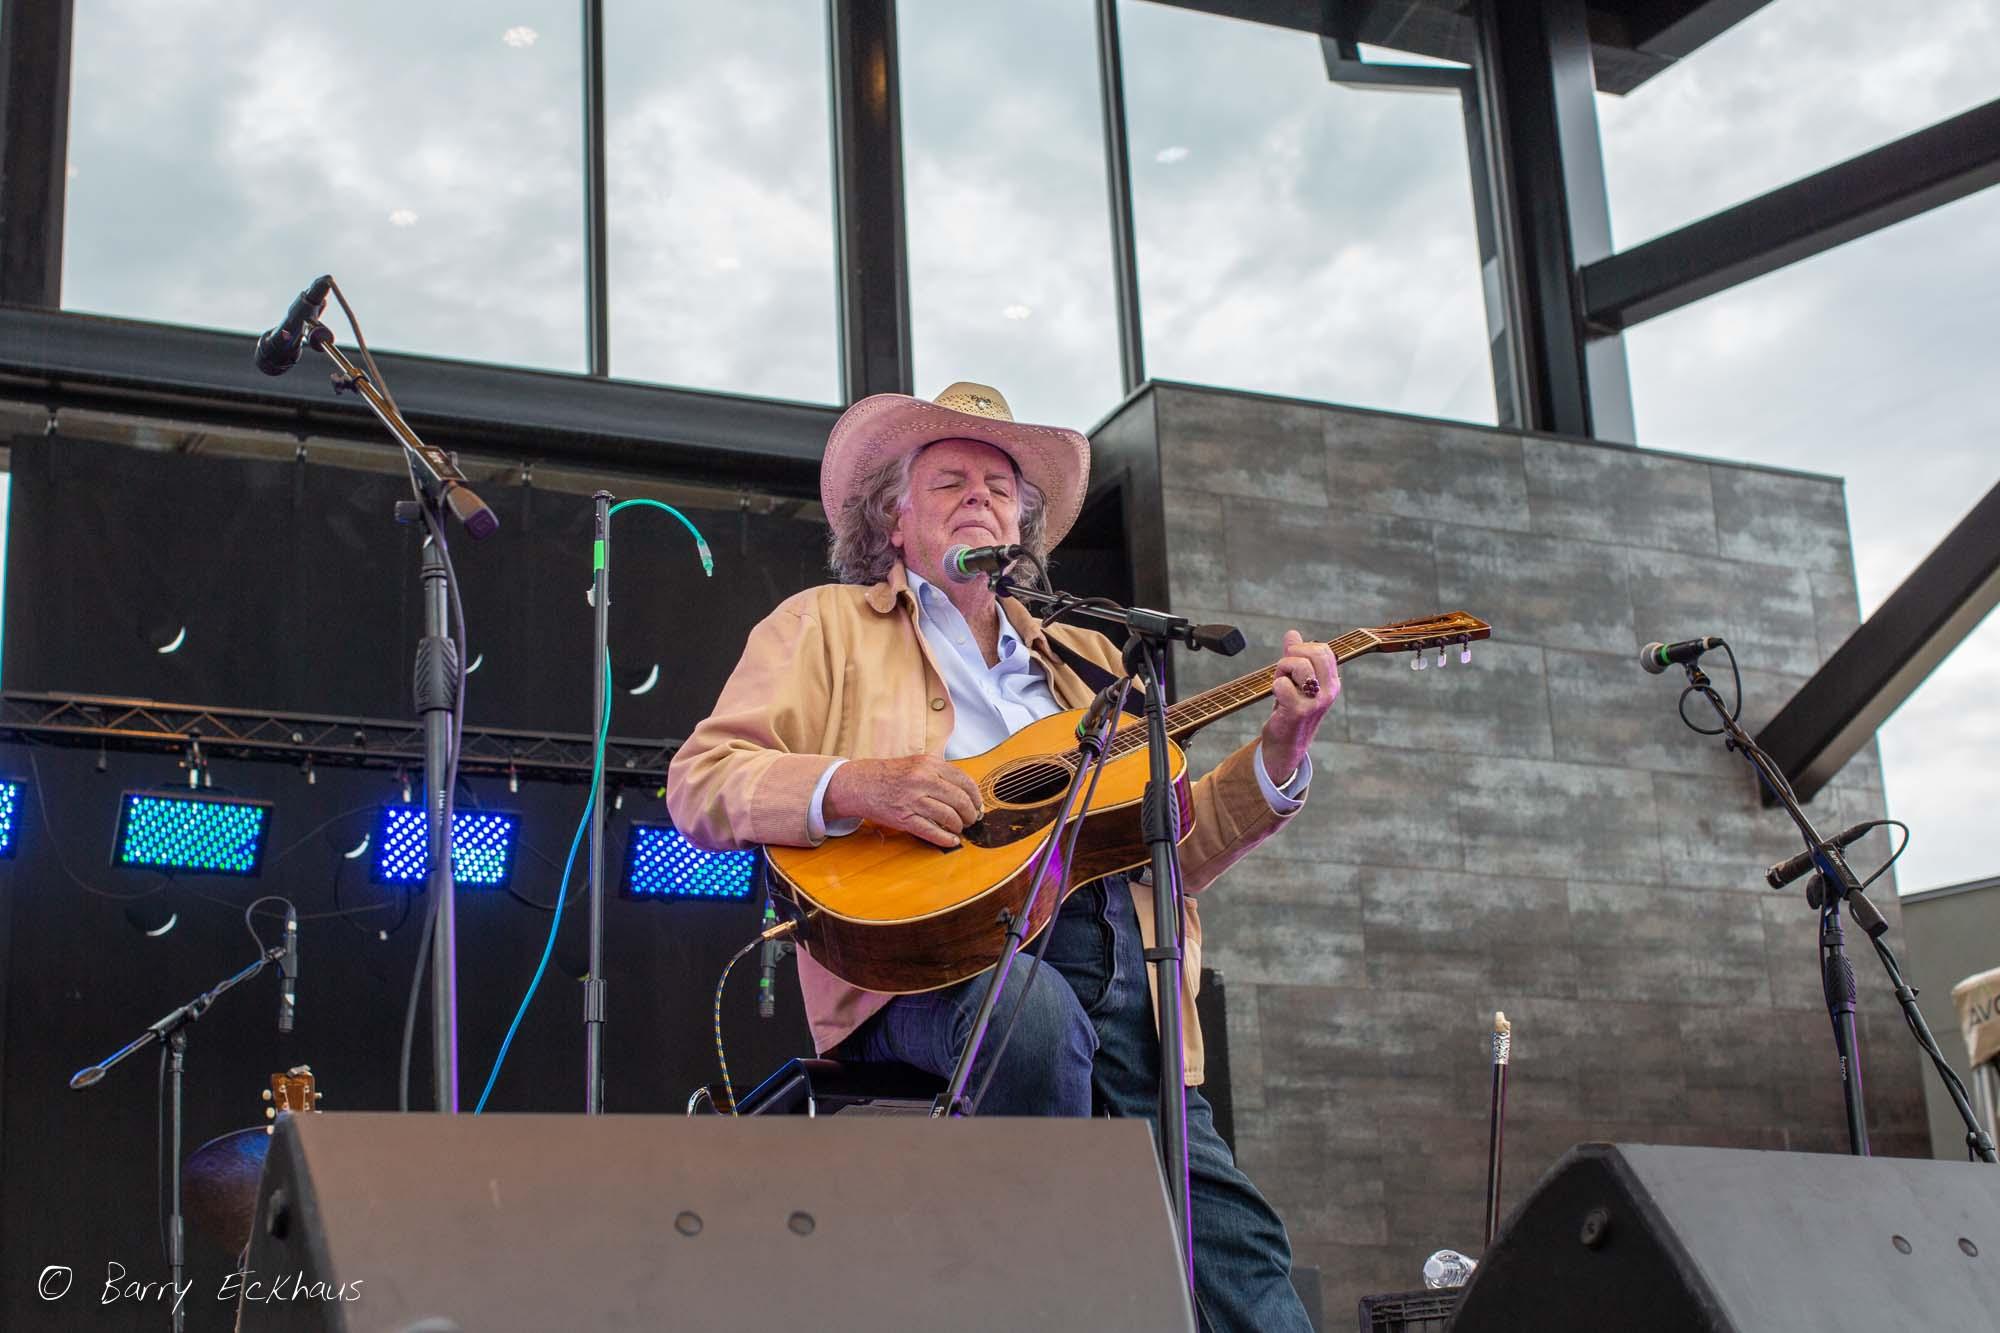 Peter Rowan in Avon, Colorado